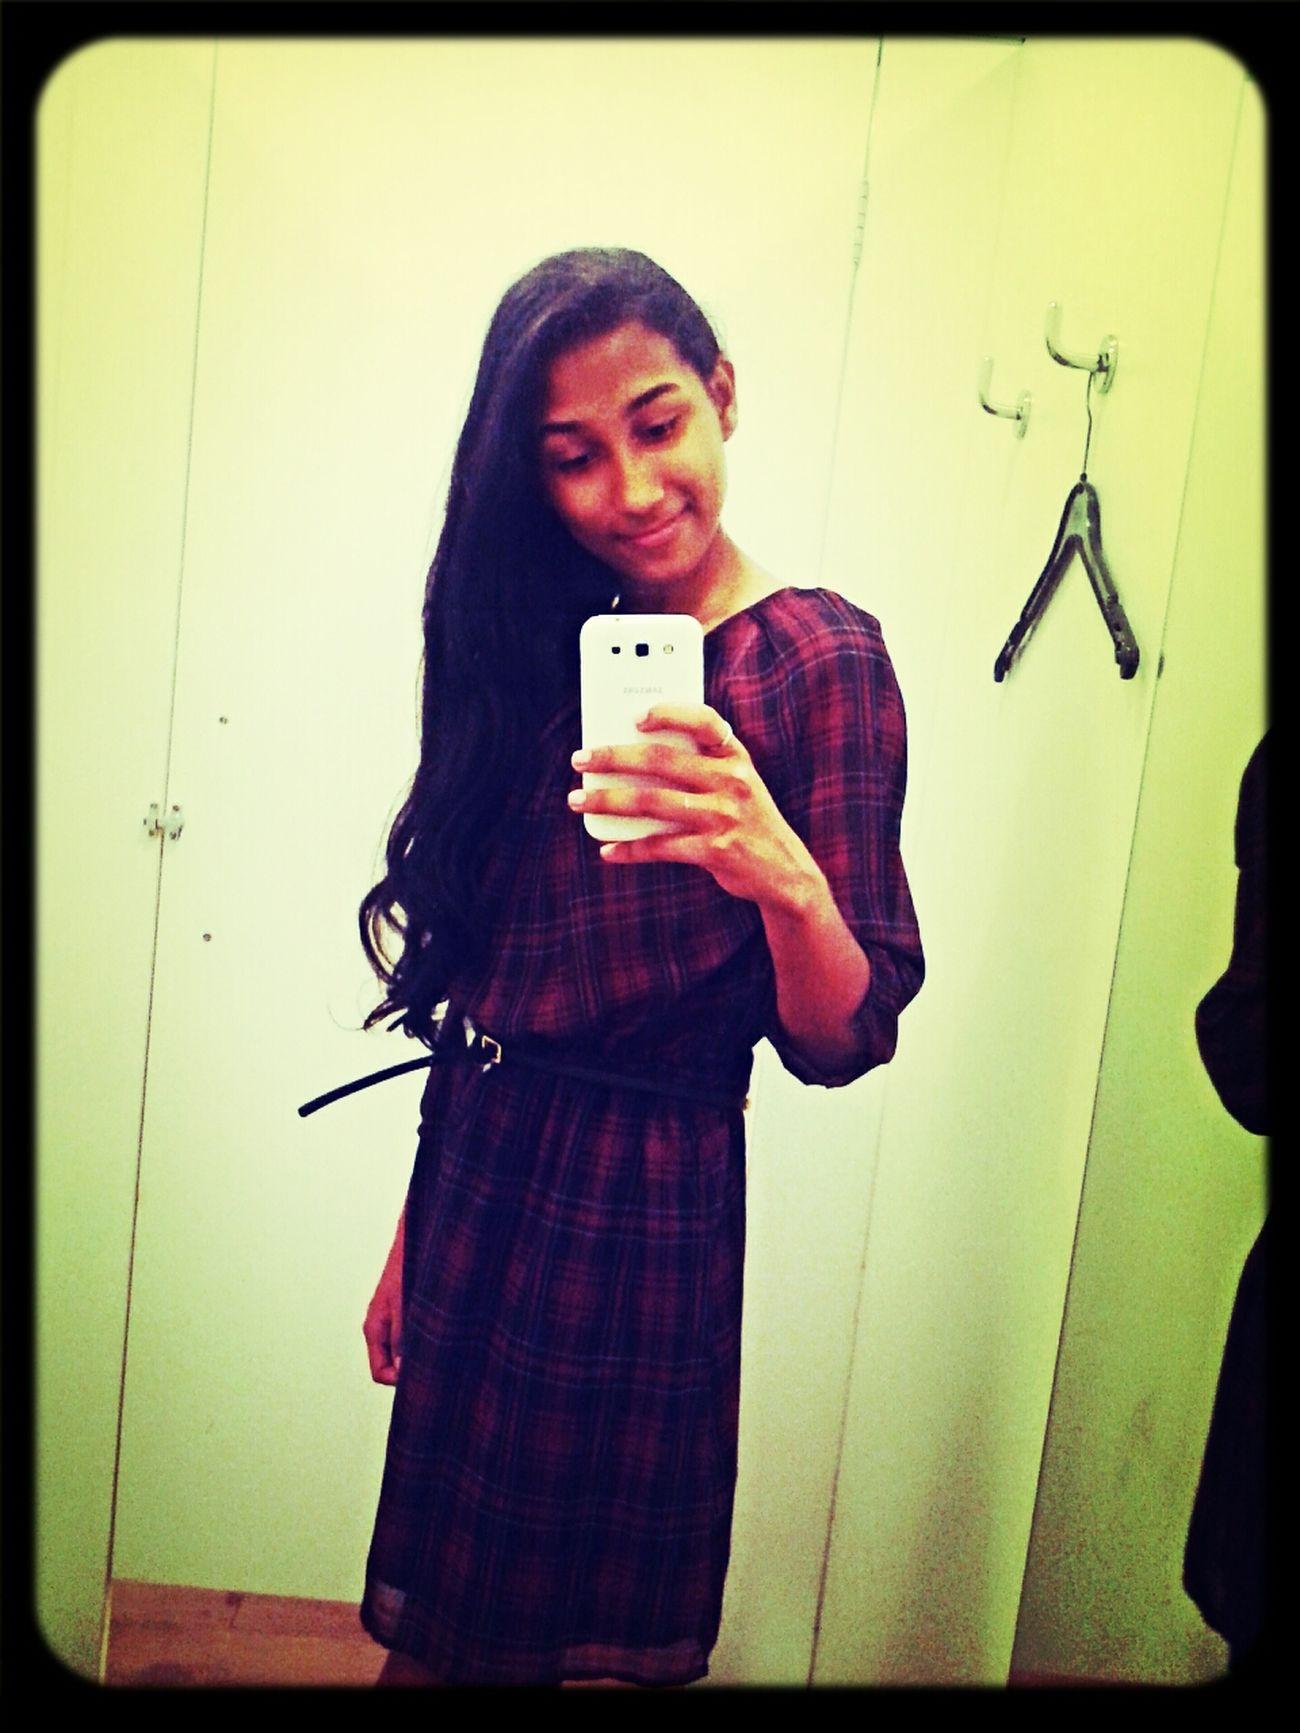 Bom Diaaa, Hehe :) #likeforlike